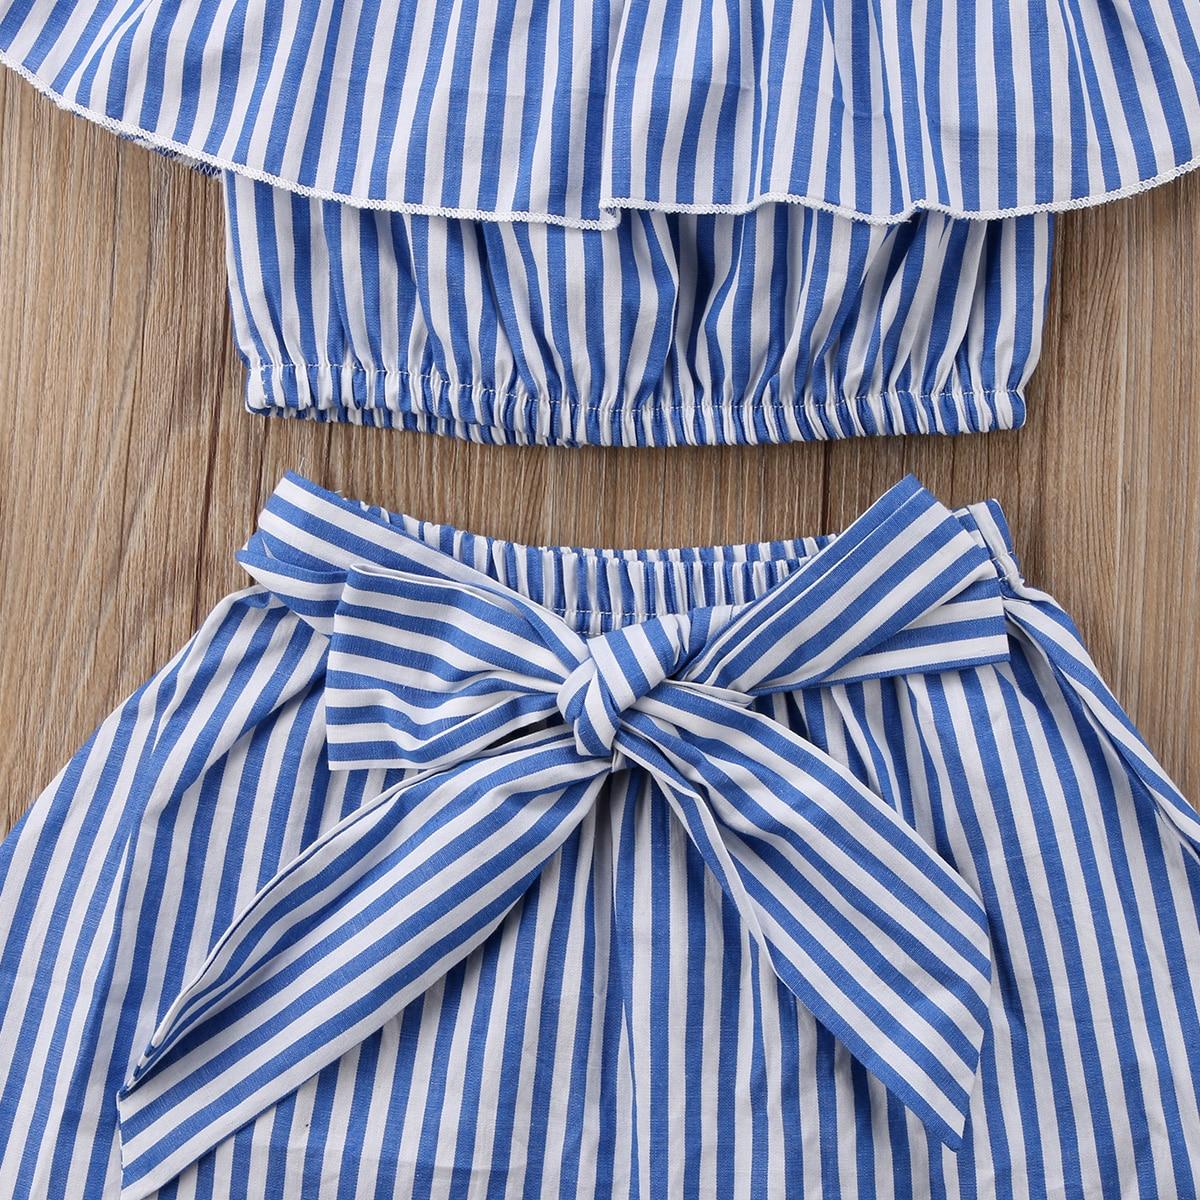 Toddler Kids Baby Girl Summer Off Shoulder Ruffle Collar T-Shirt Top Outfits Set